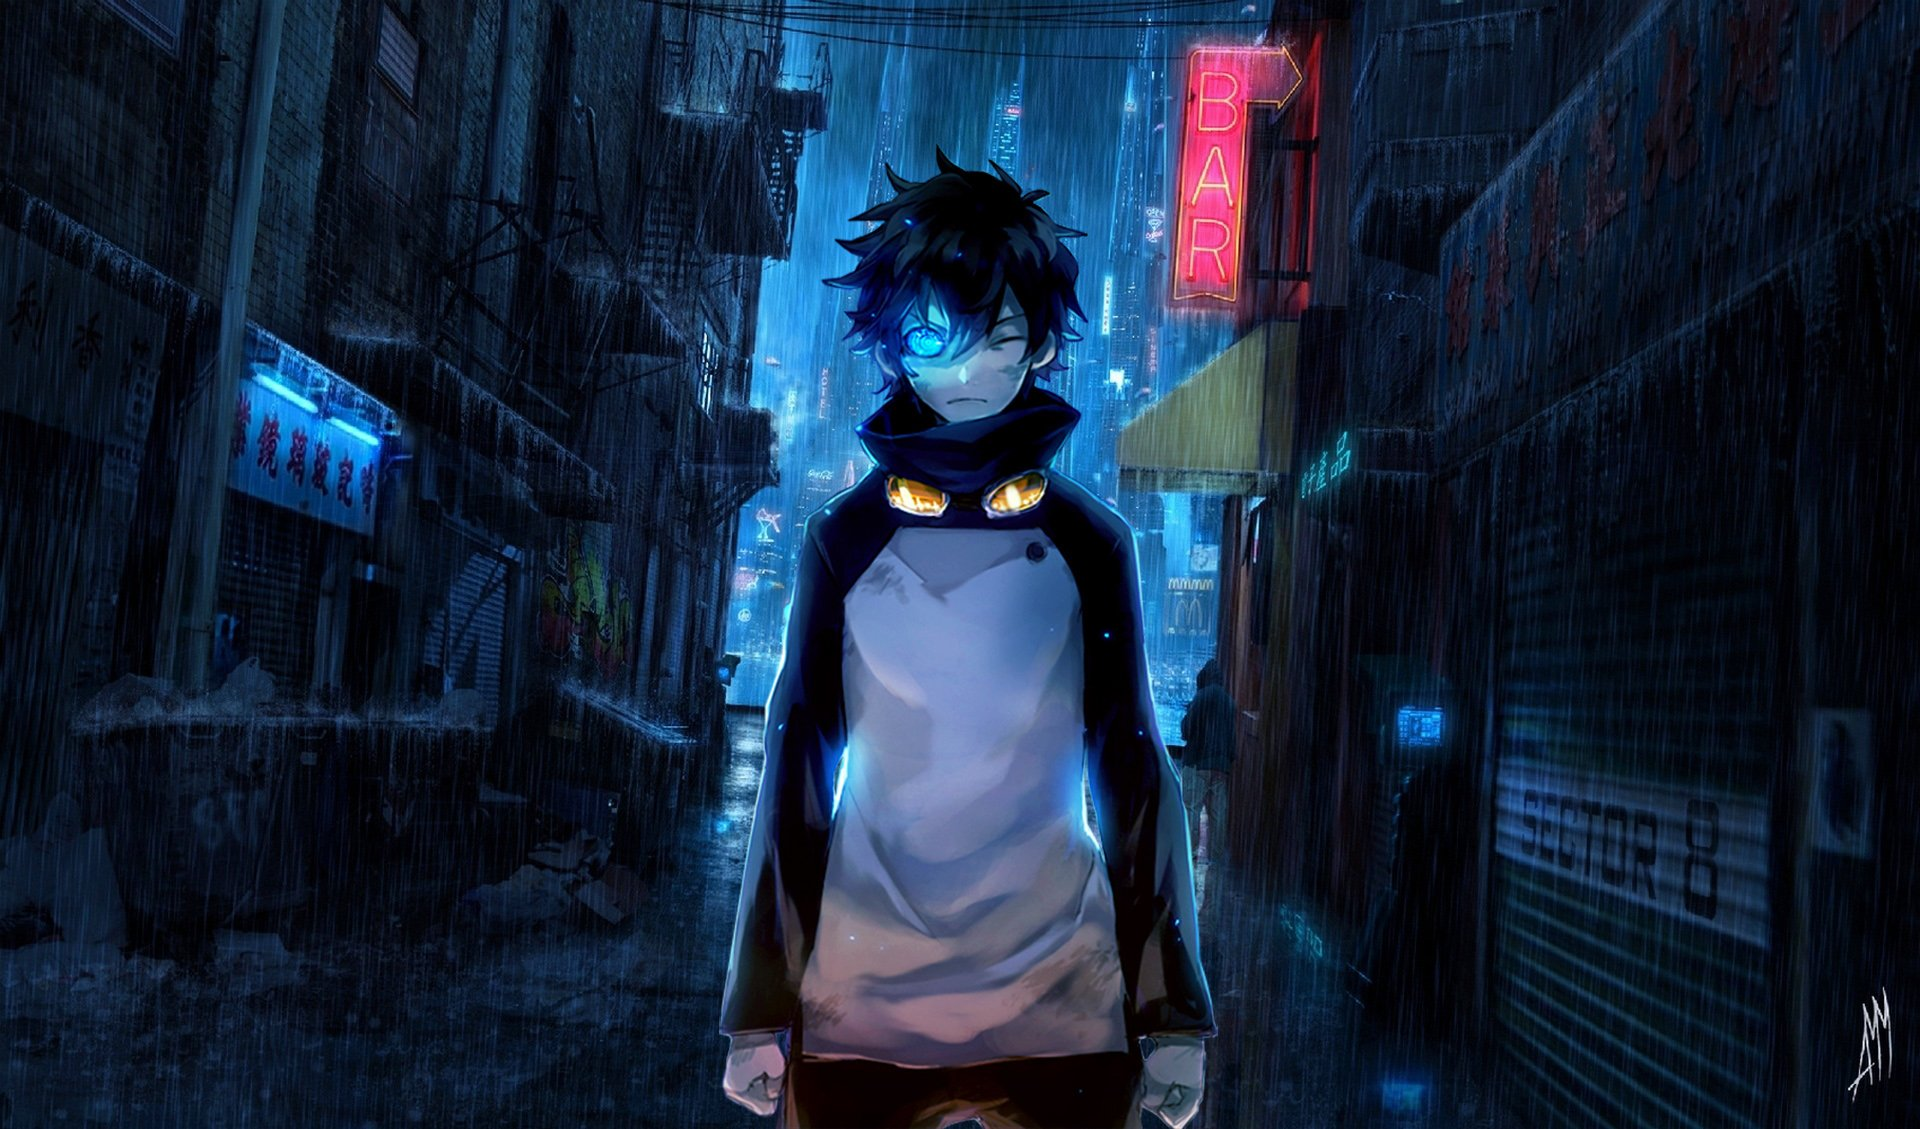 Anime - Blood Blockade Battlefront  City Anime Leonardo Watch Wallpaper